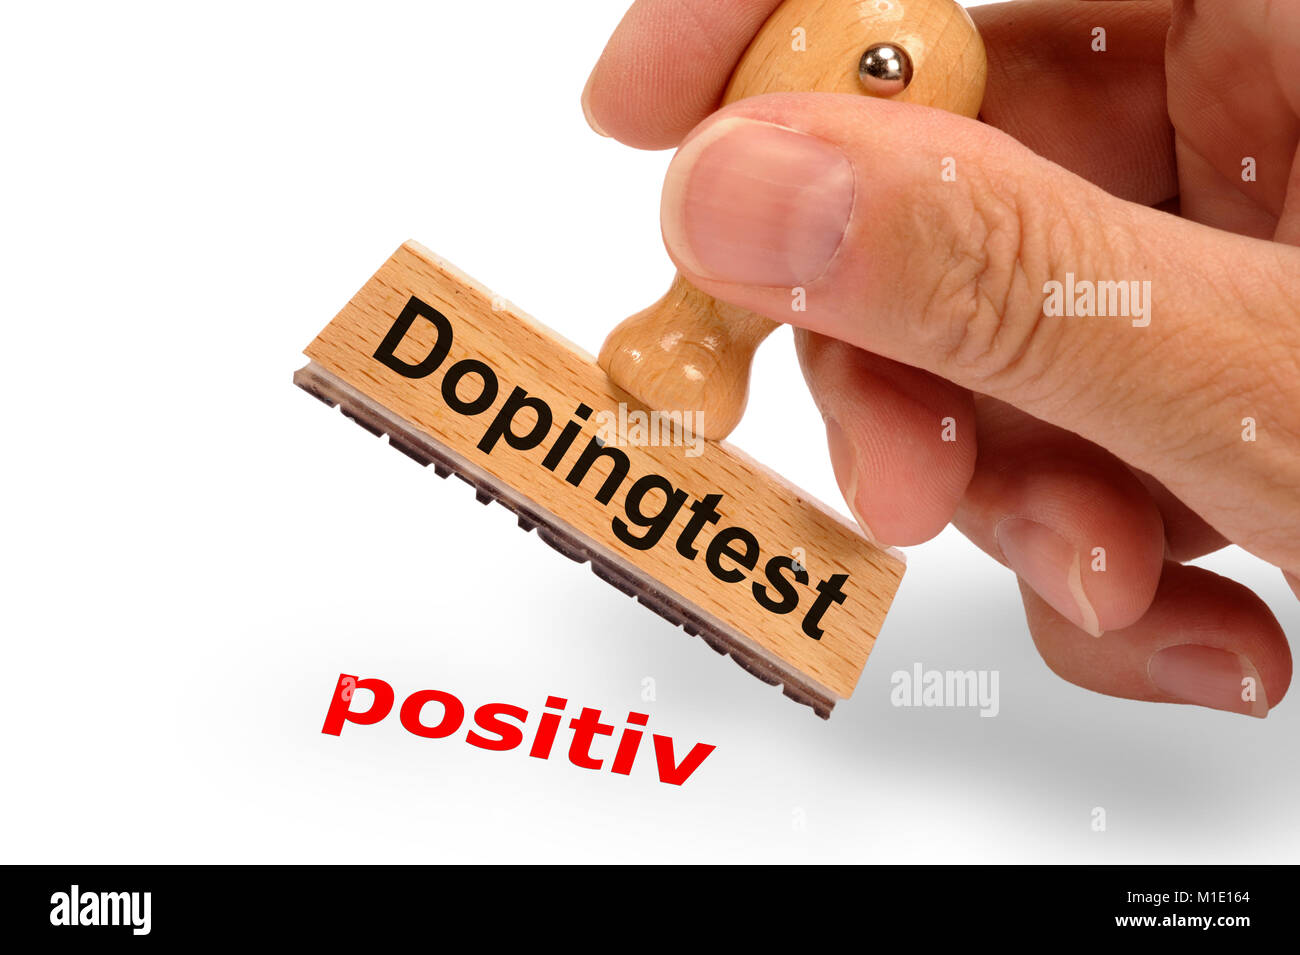 Stempel zeigt positiven Dopingtest im Sport - Stock Image